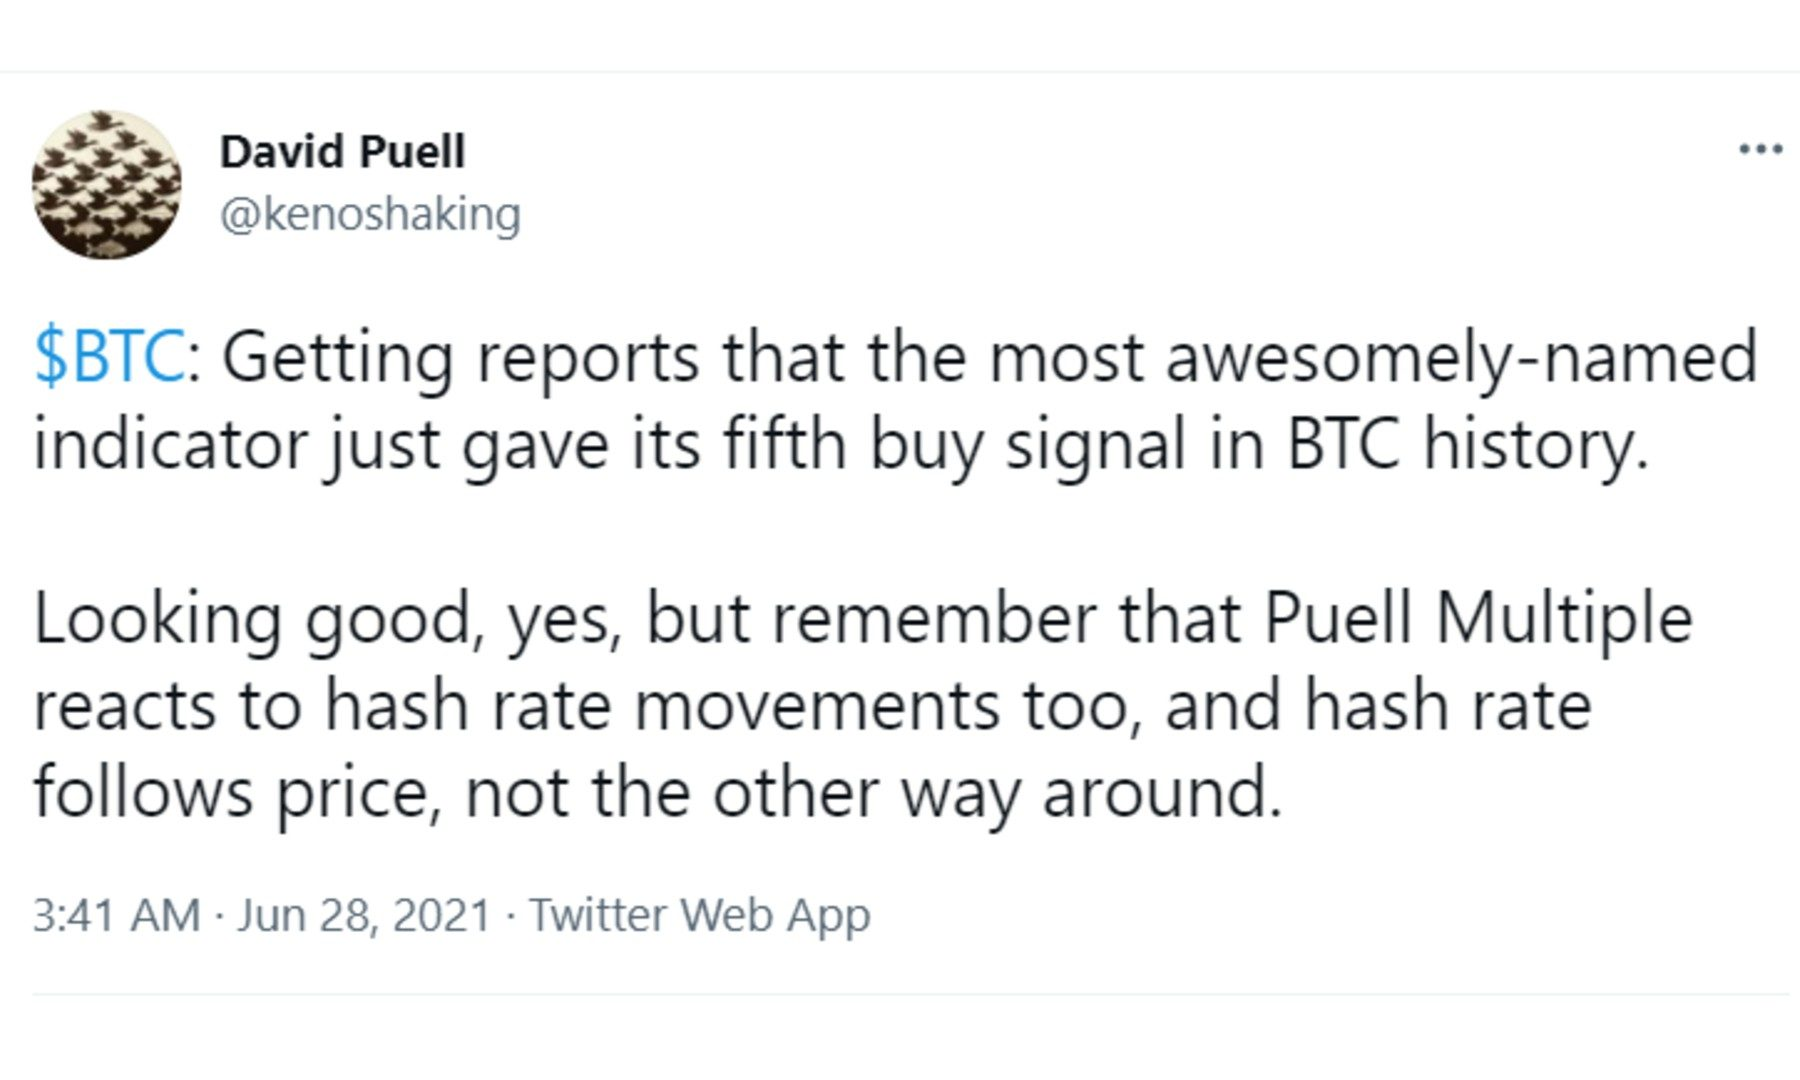 David Puell Twitter